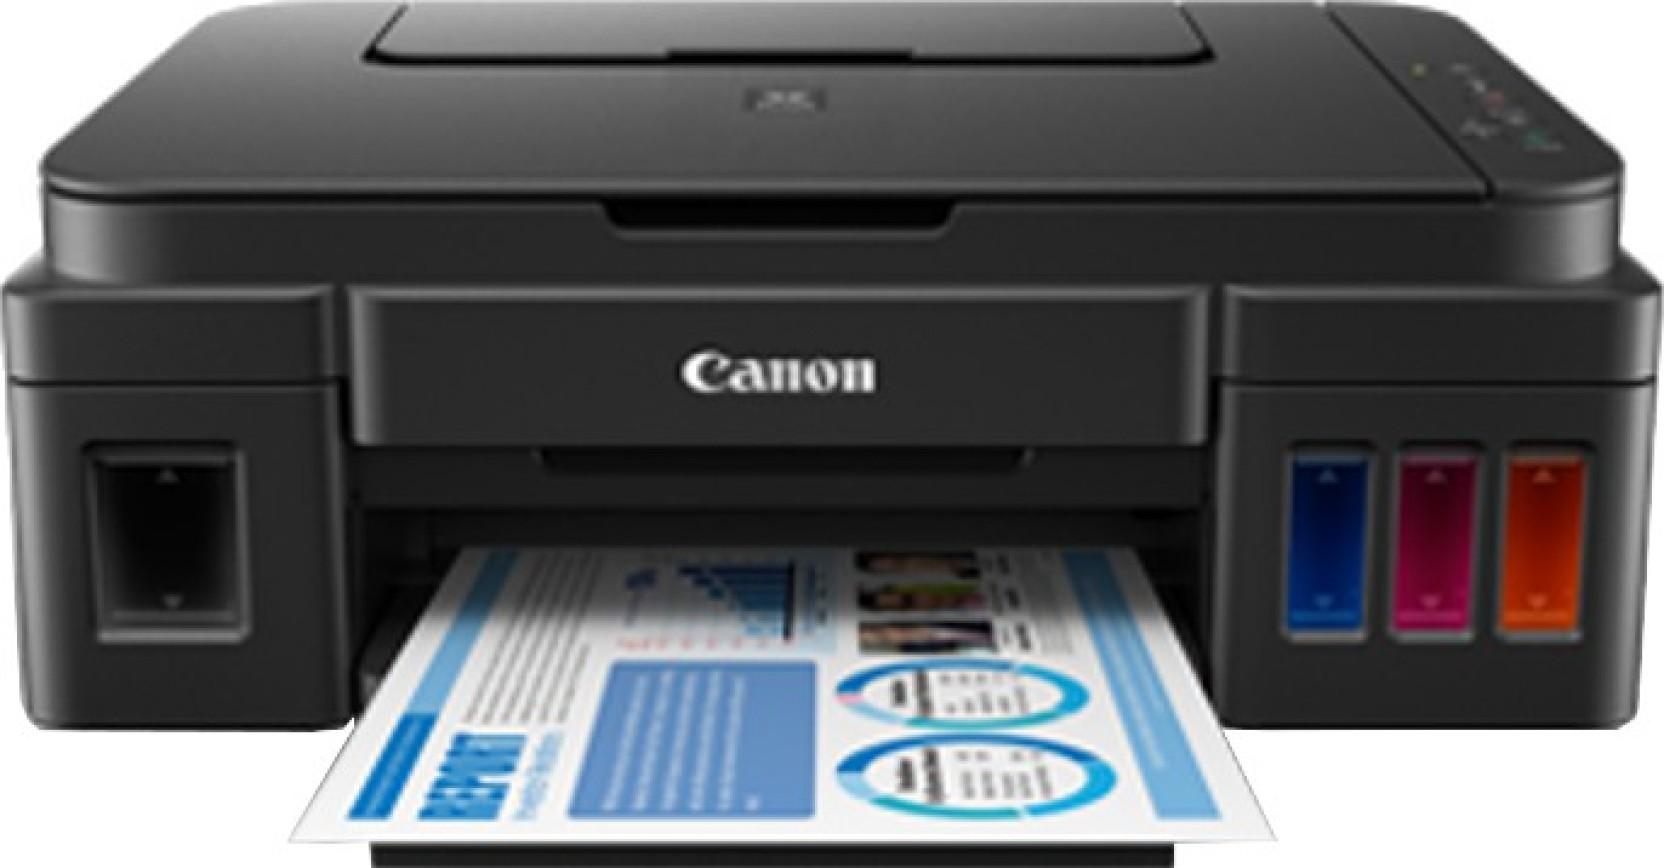 Canon G2002 Multi Function Printer Royal 90 Polos Envelope 80 Gsm White 100 Envelopes Box 1 Home